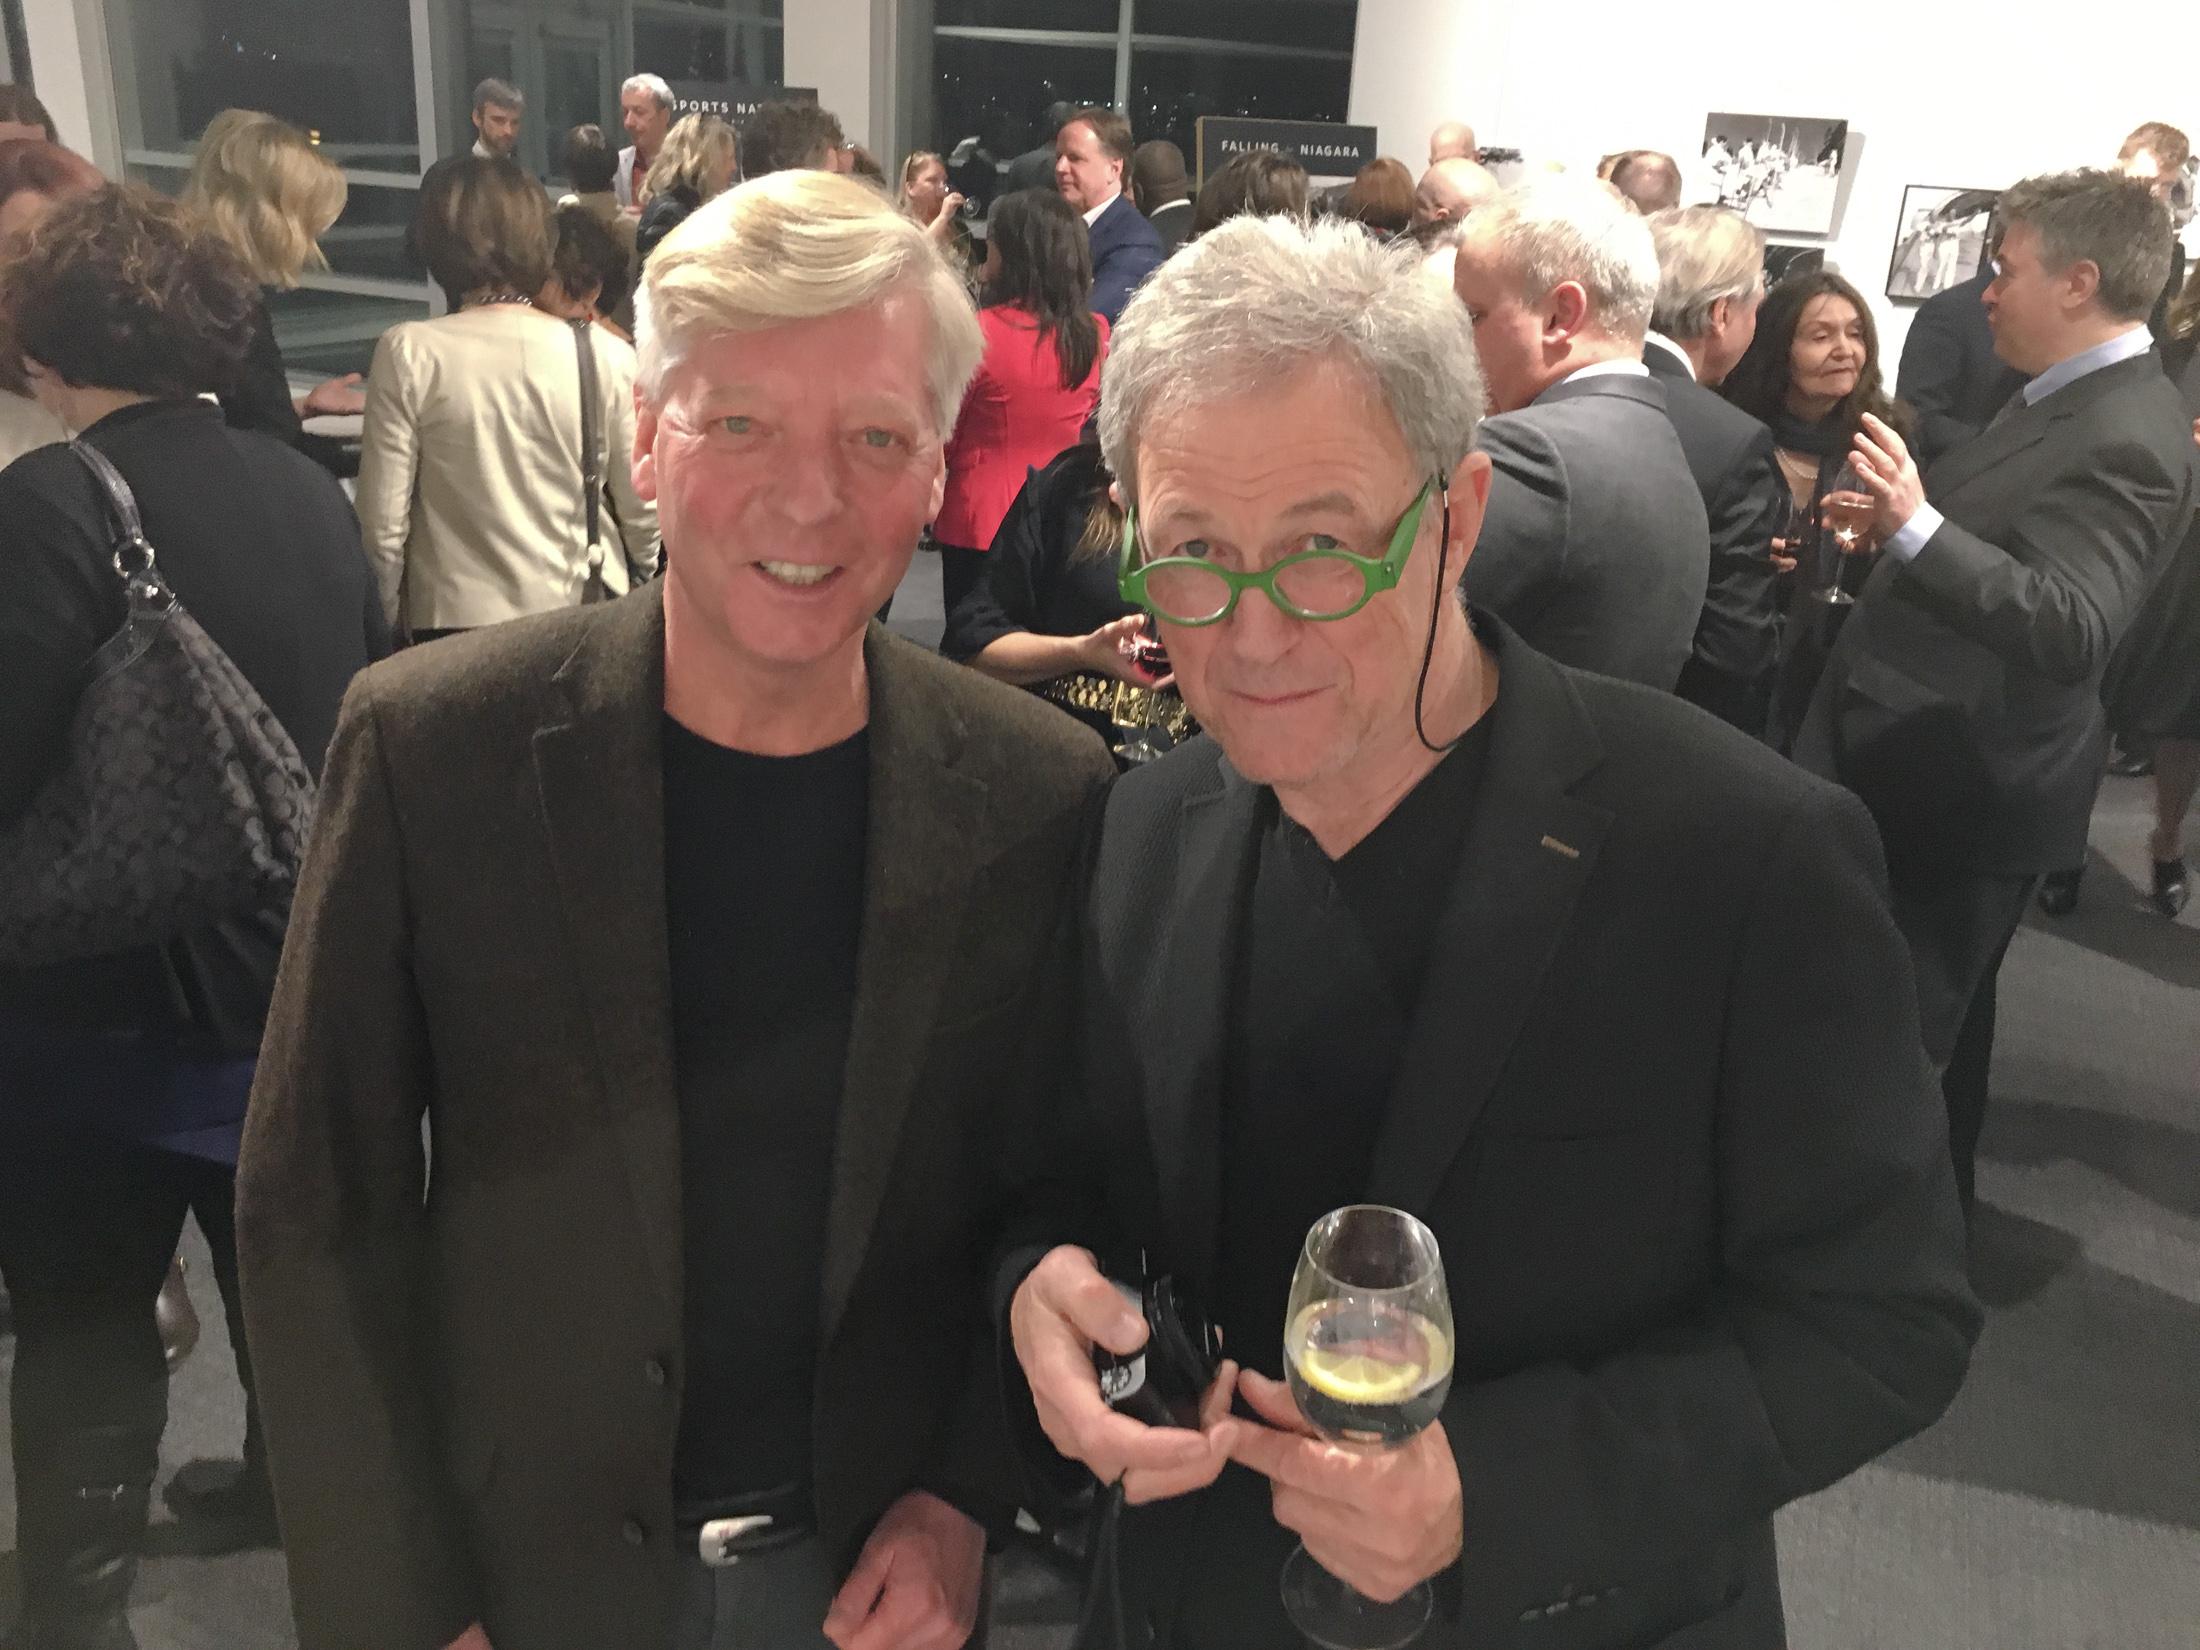 Stephen Gorman and legendary Canadian photographer Yuri Dojc at the reception.